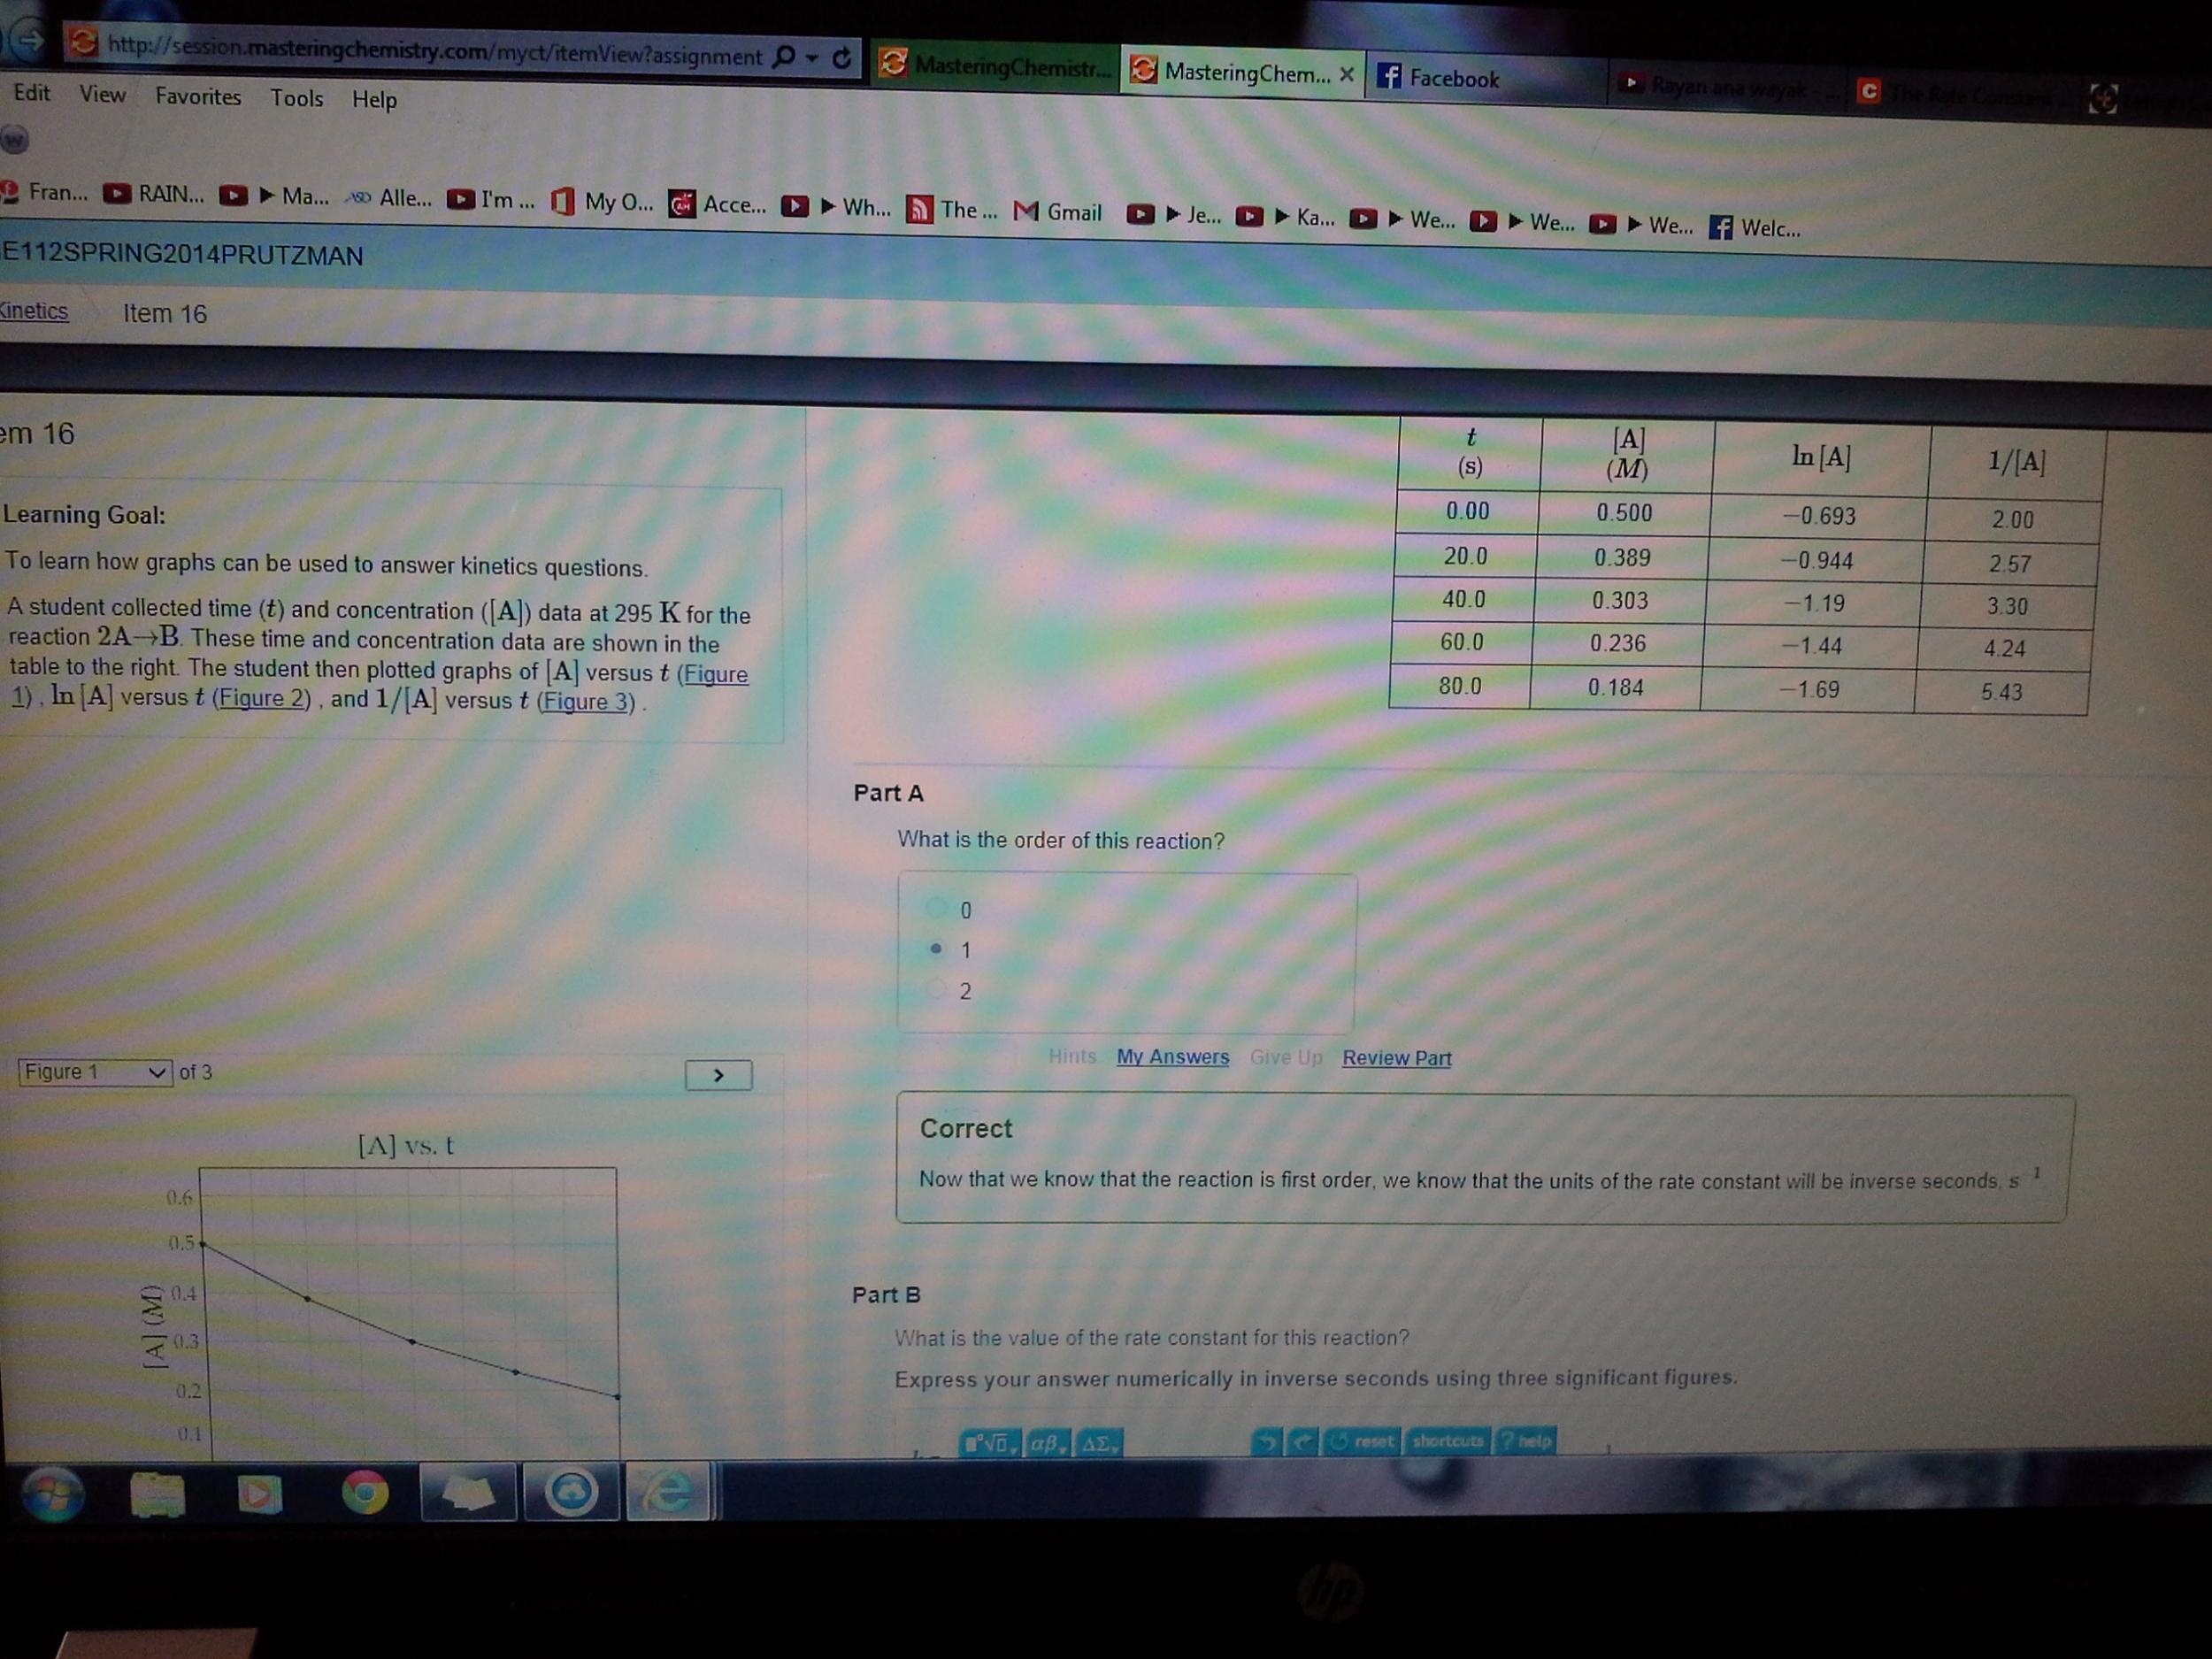 homework help please essay on good friend my homework help is a reputed for complete homework and assignment help